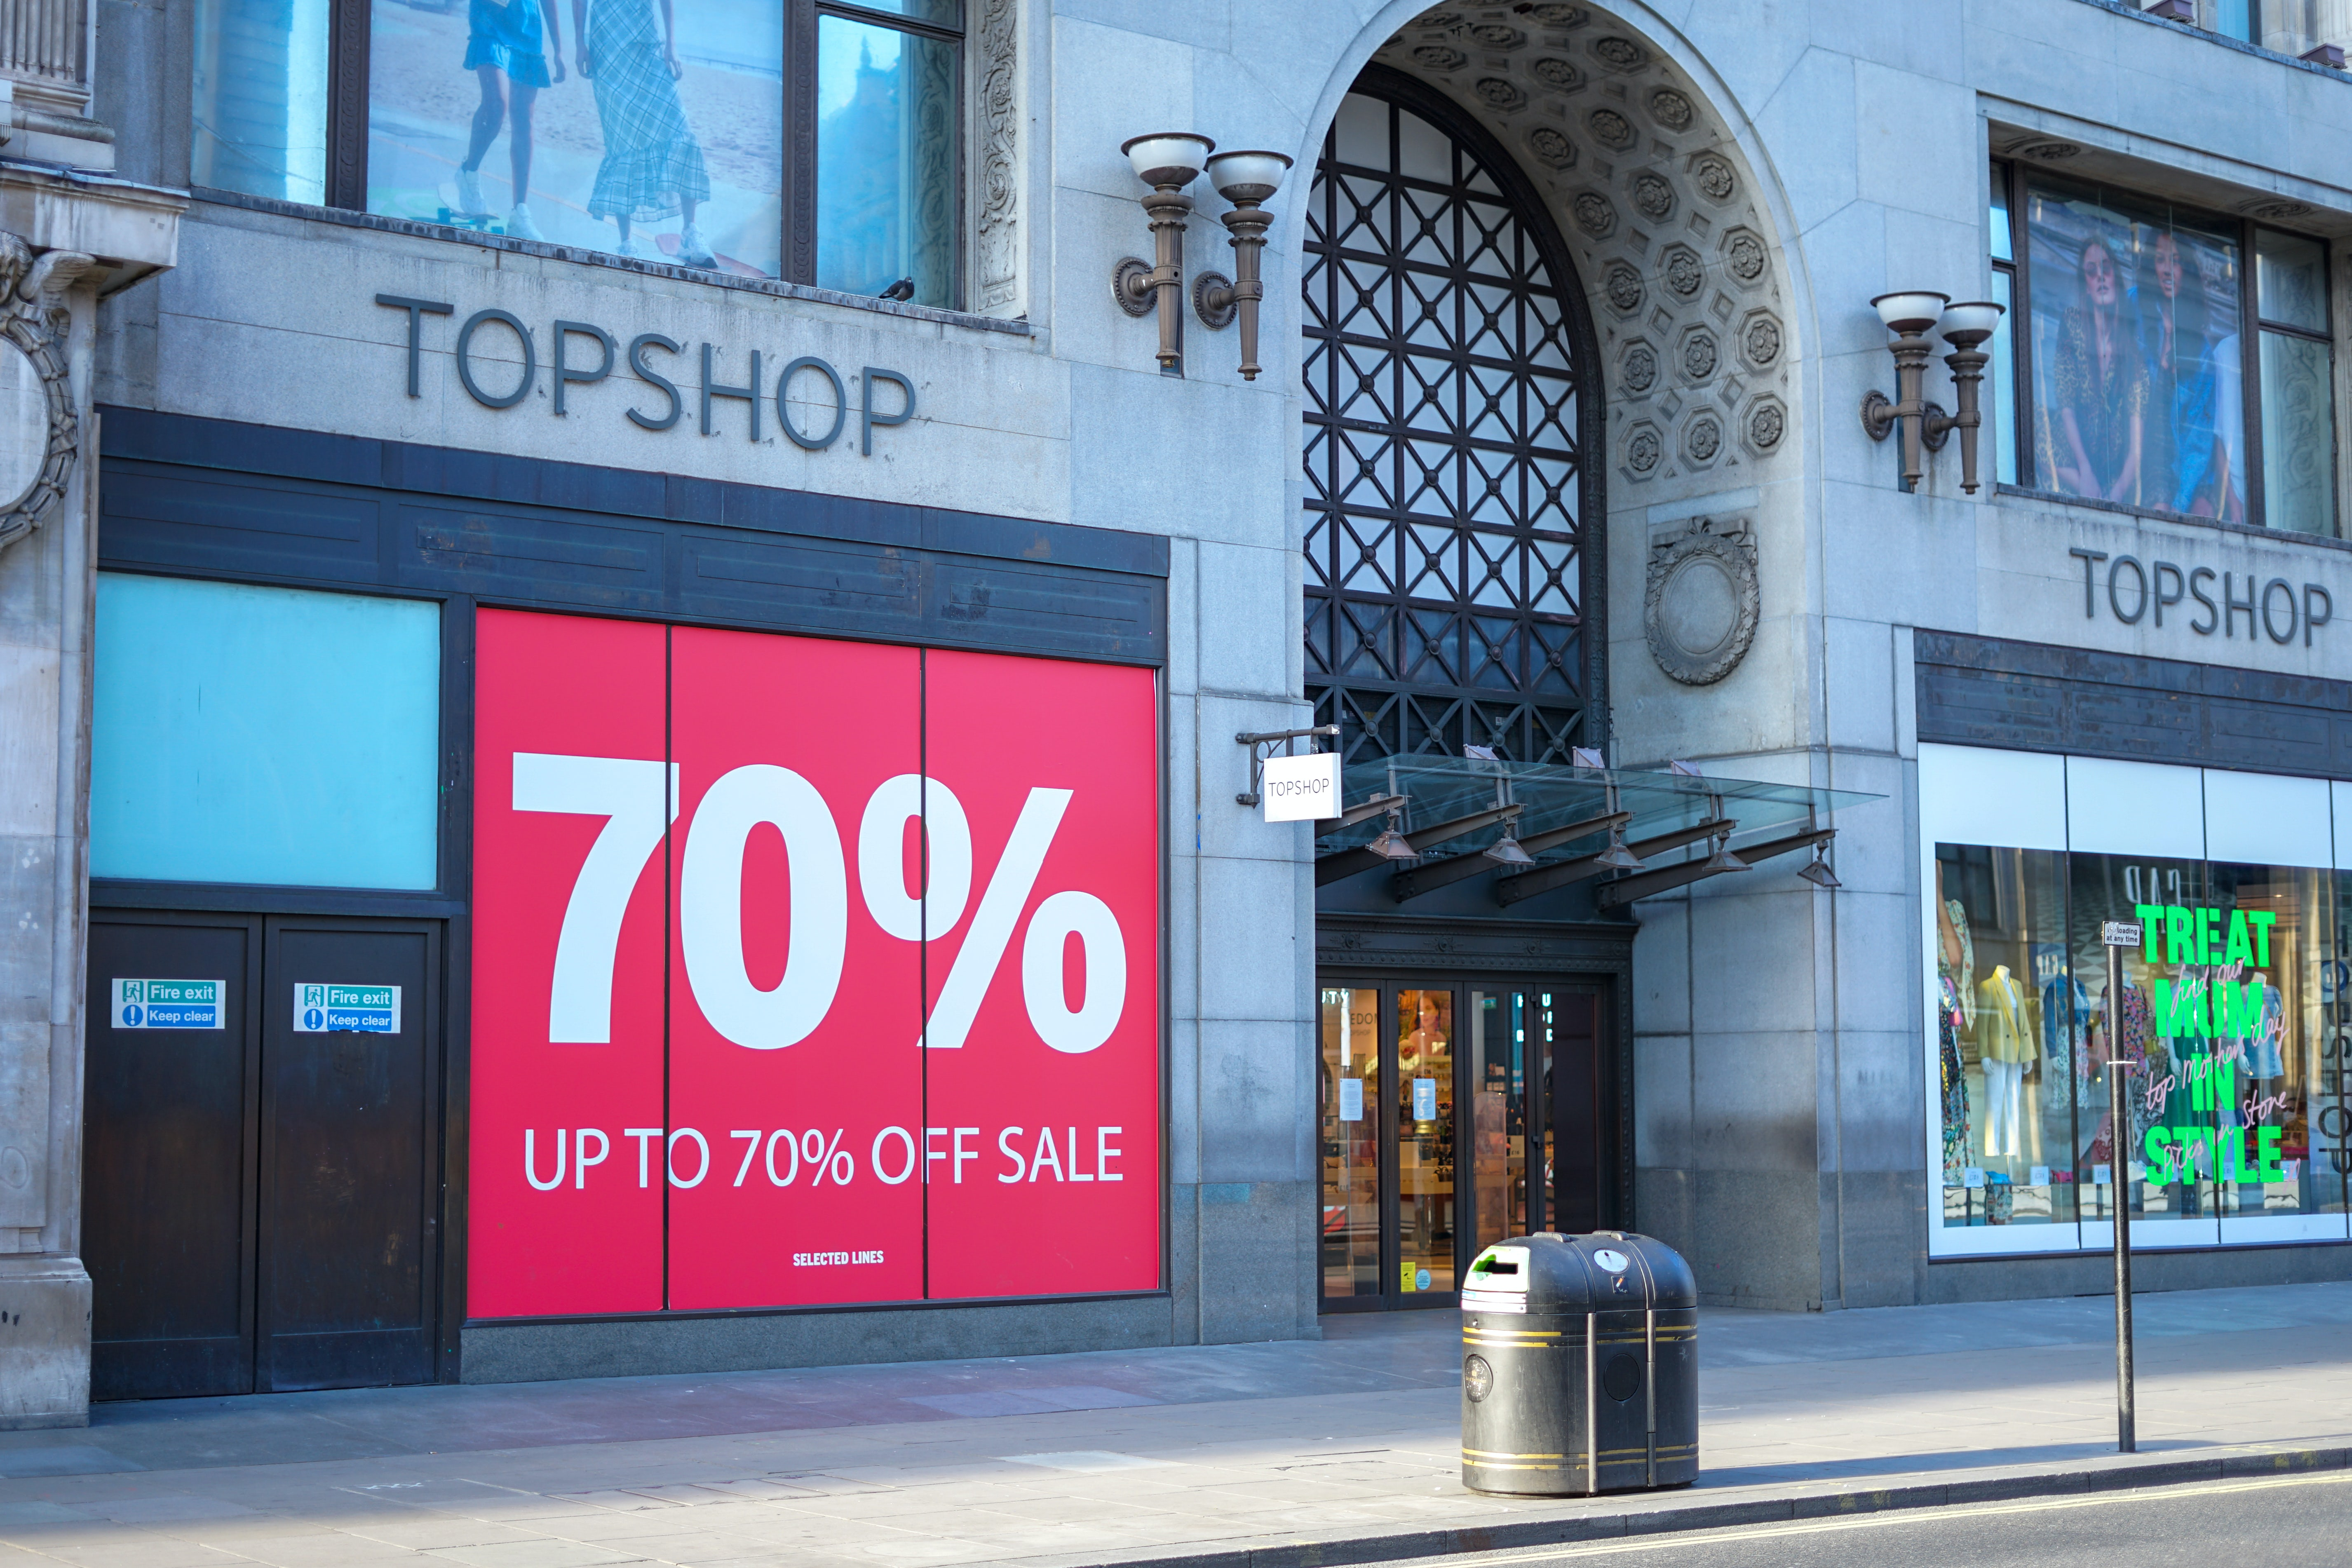 Topshop store in London, UK. Shutterstock.